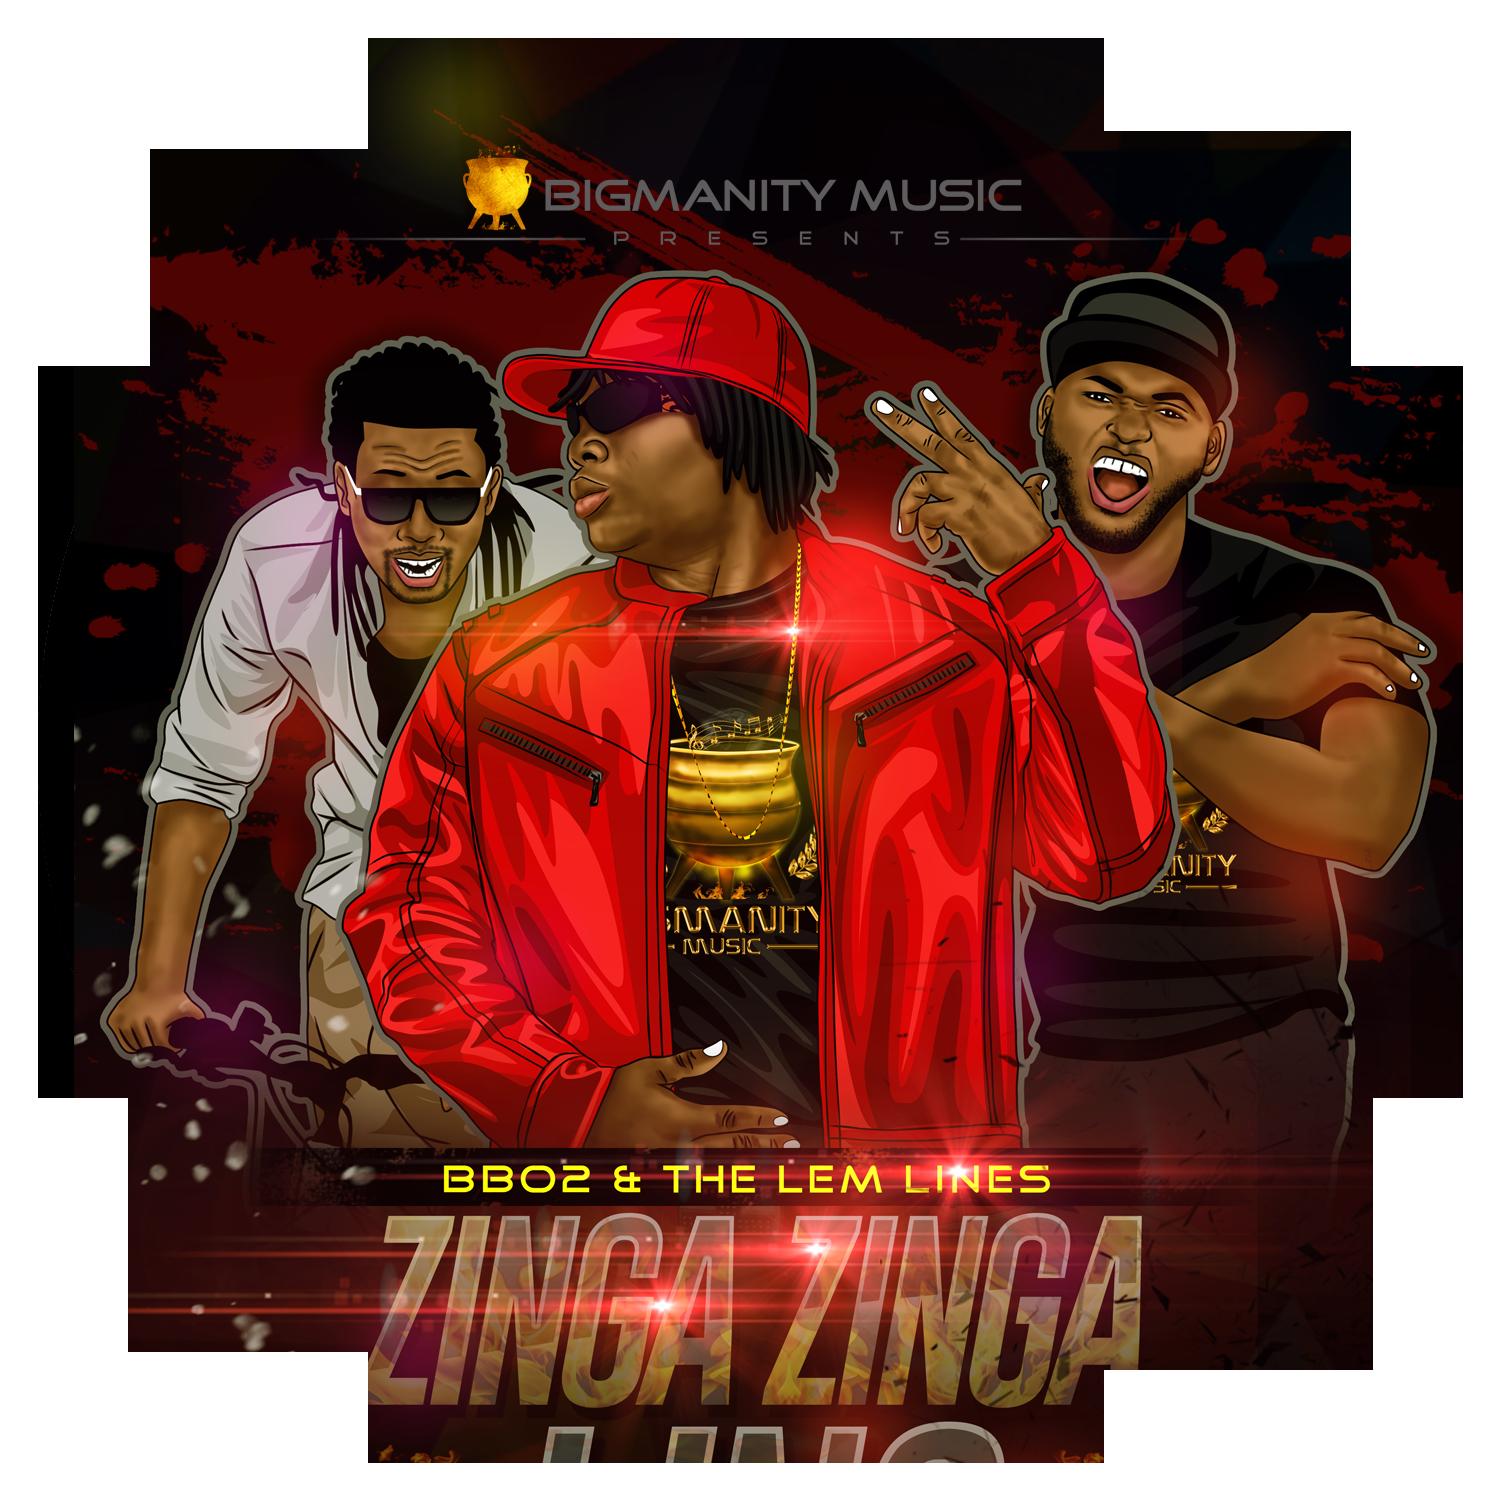 BB02 & THE LEM LINES – ZINGA ZINGA LING